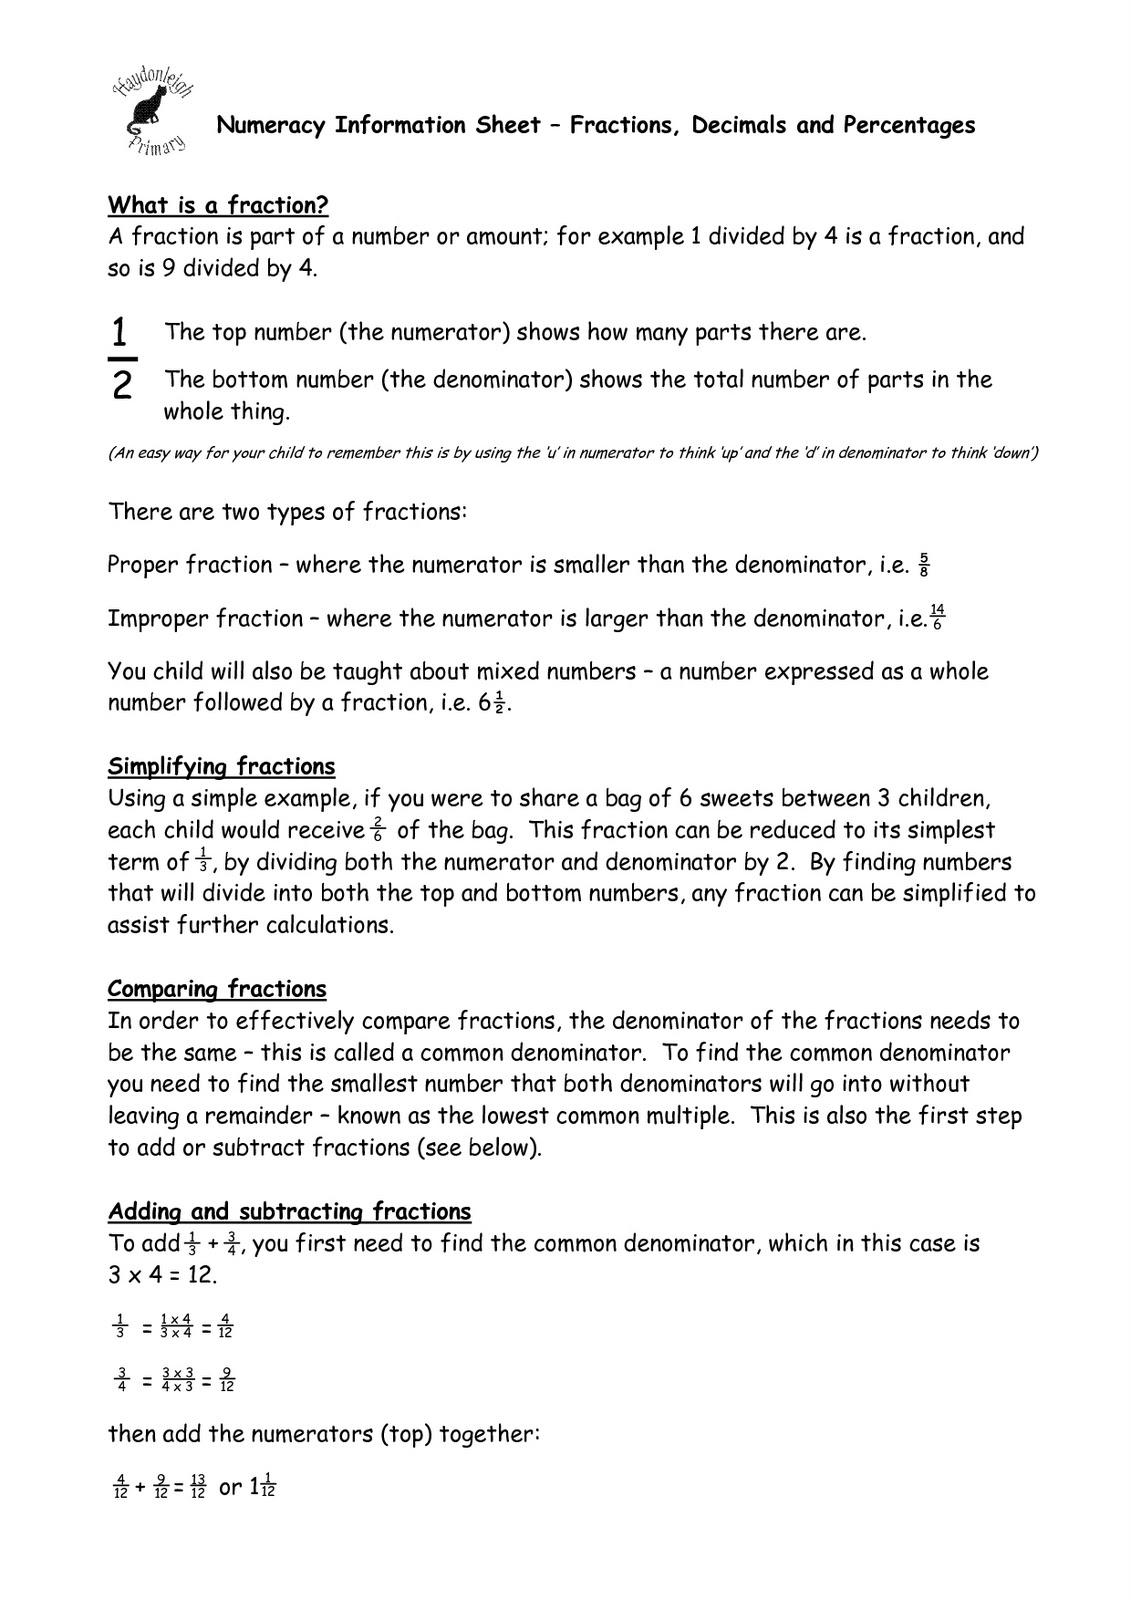 Worksheet Linking Fractions Decimals And Percentages Ks2 Worksheet  Fractions Decimals And Percentages Worksheets Ks2 Converting How